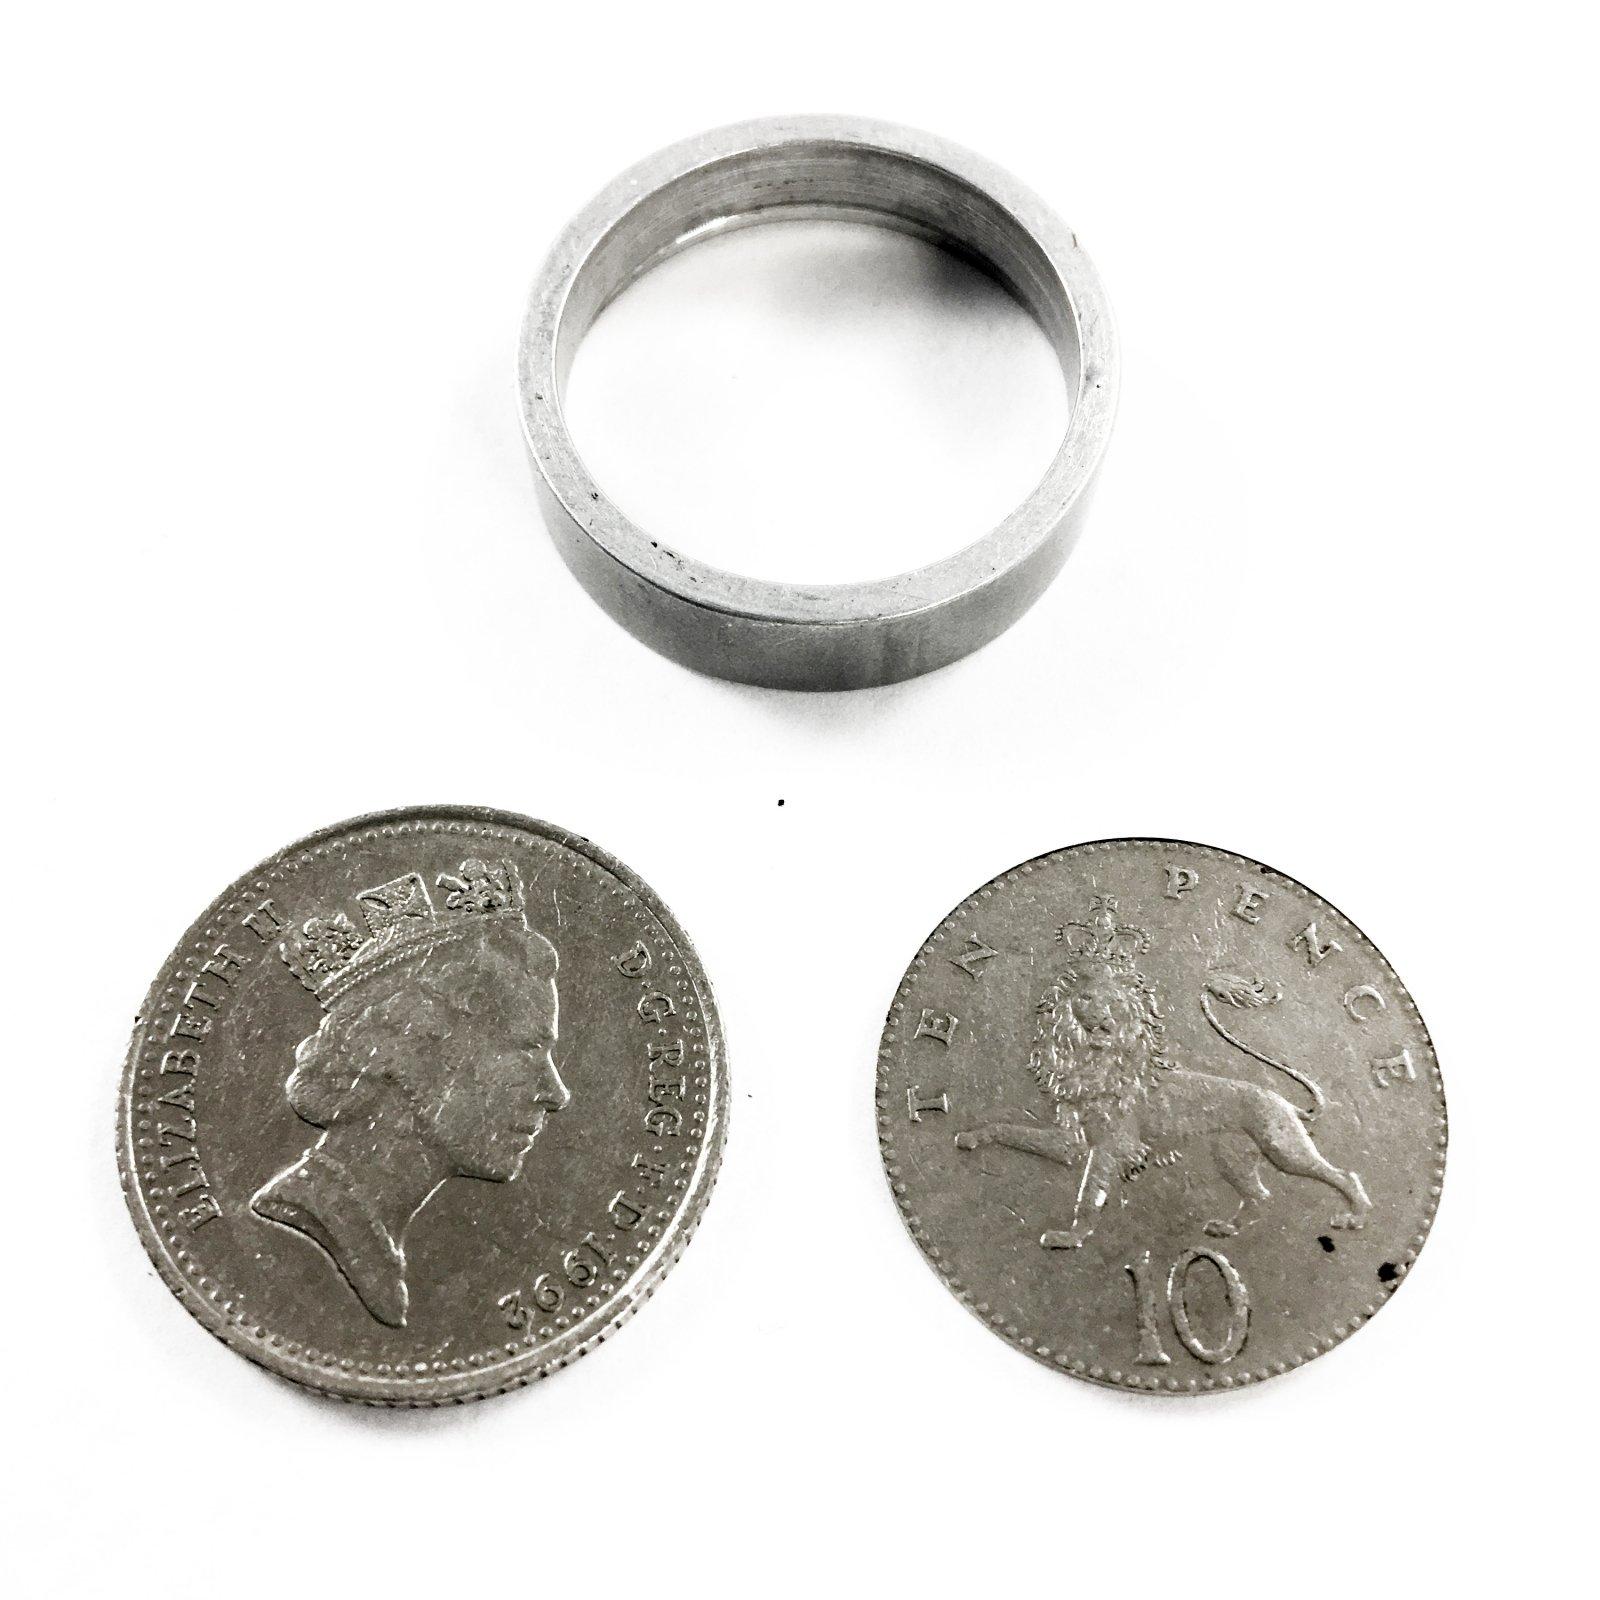 Covert Compartment 10c Australian Coin